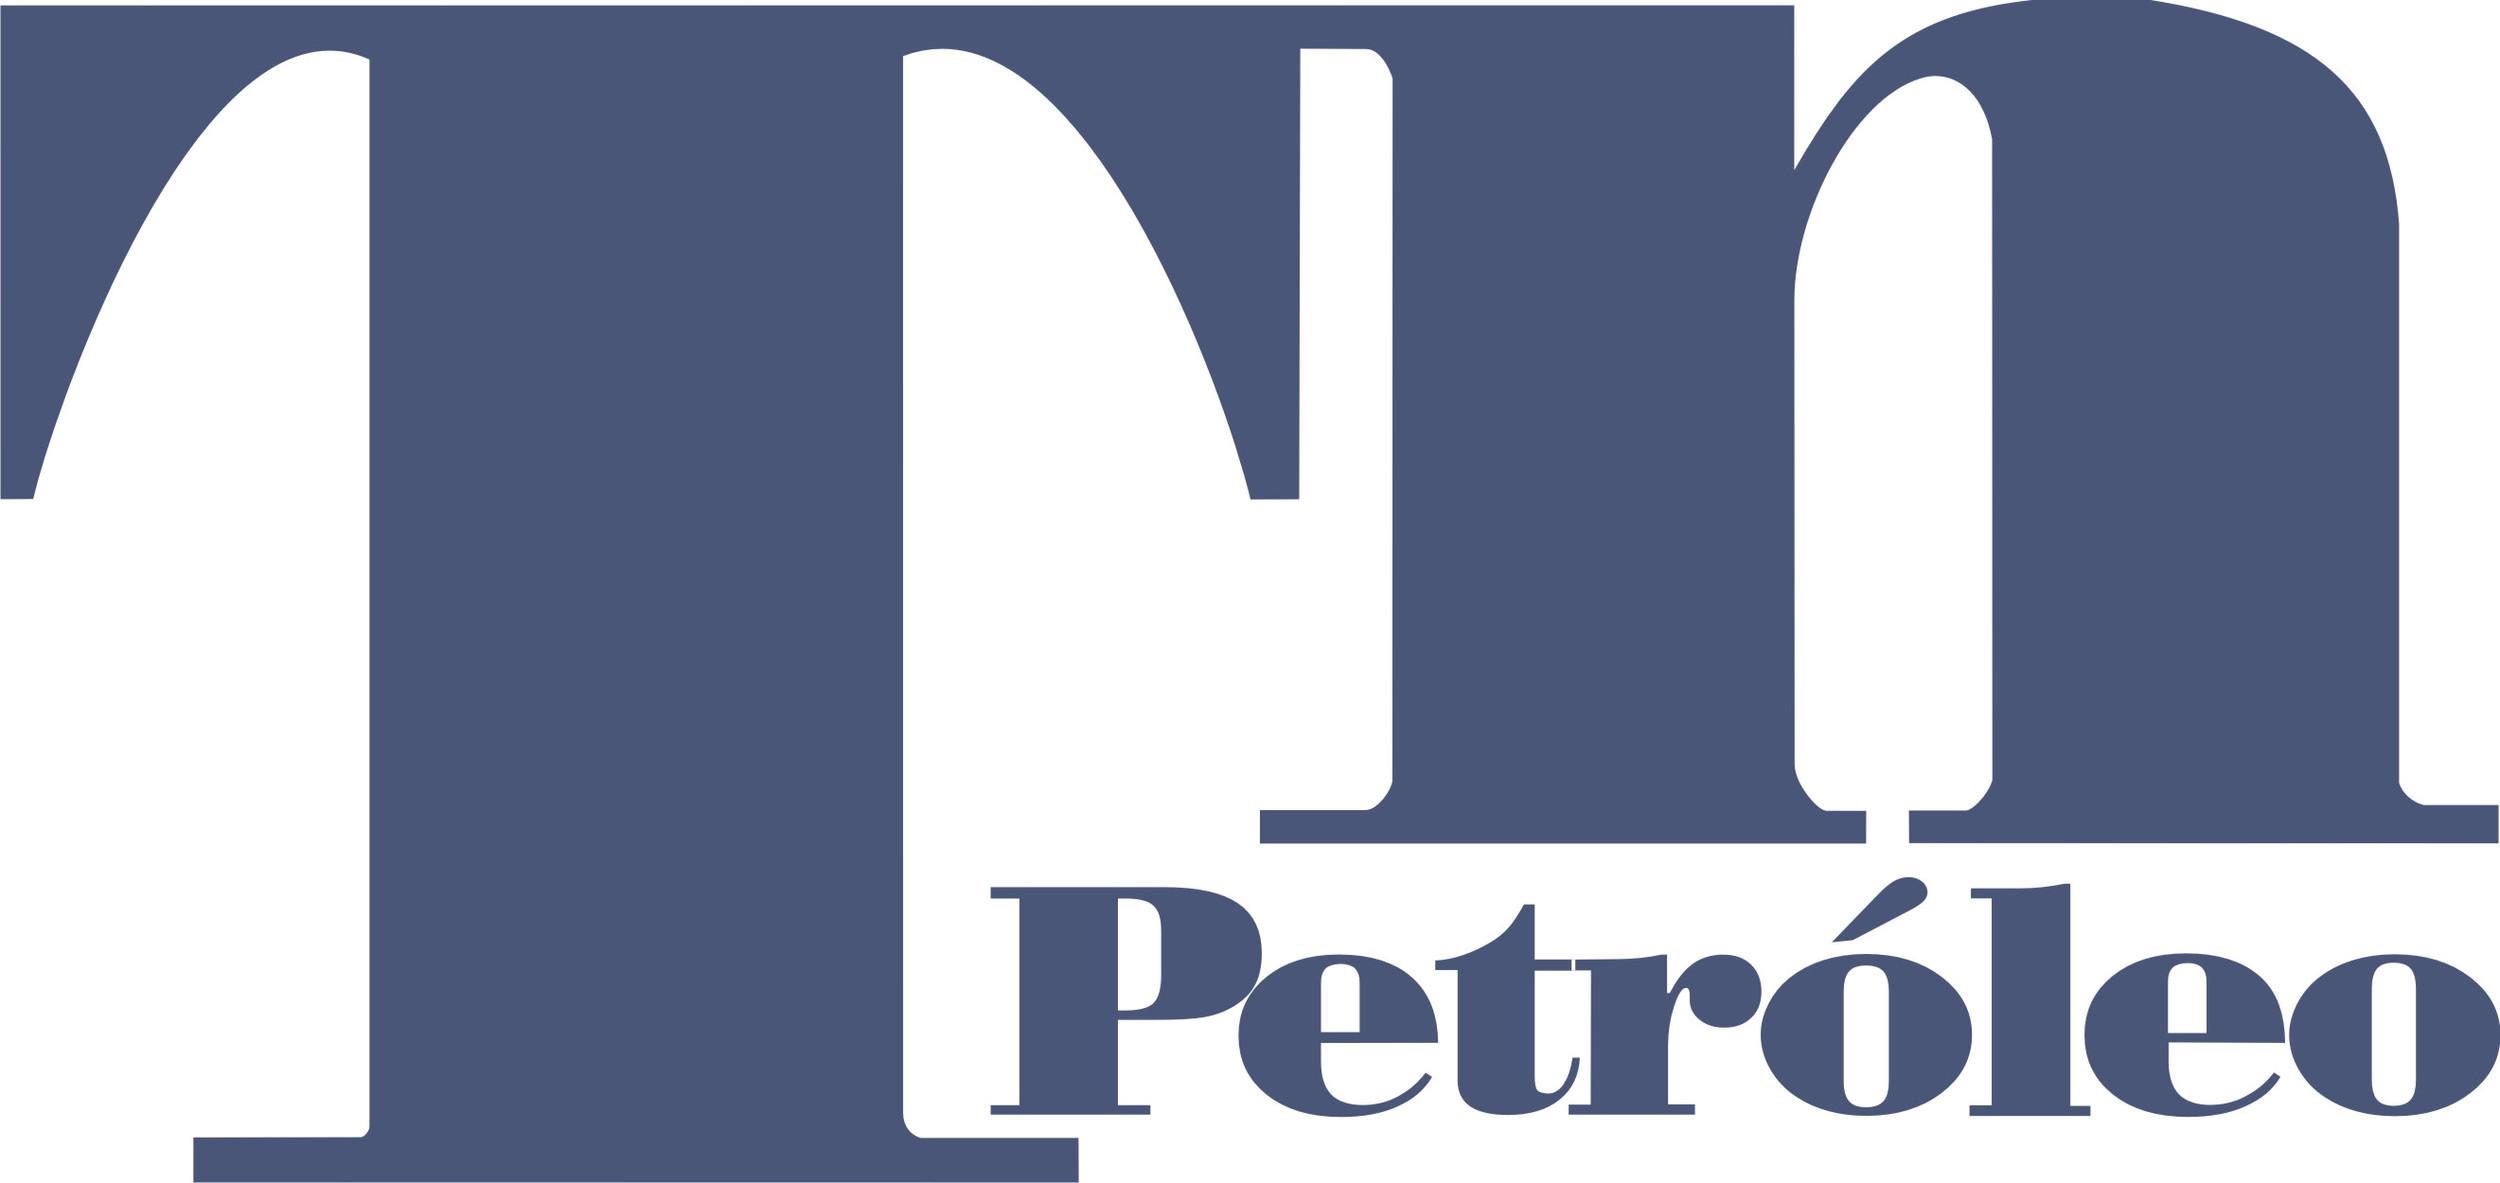 tn petroleo logotipo.jpg